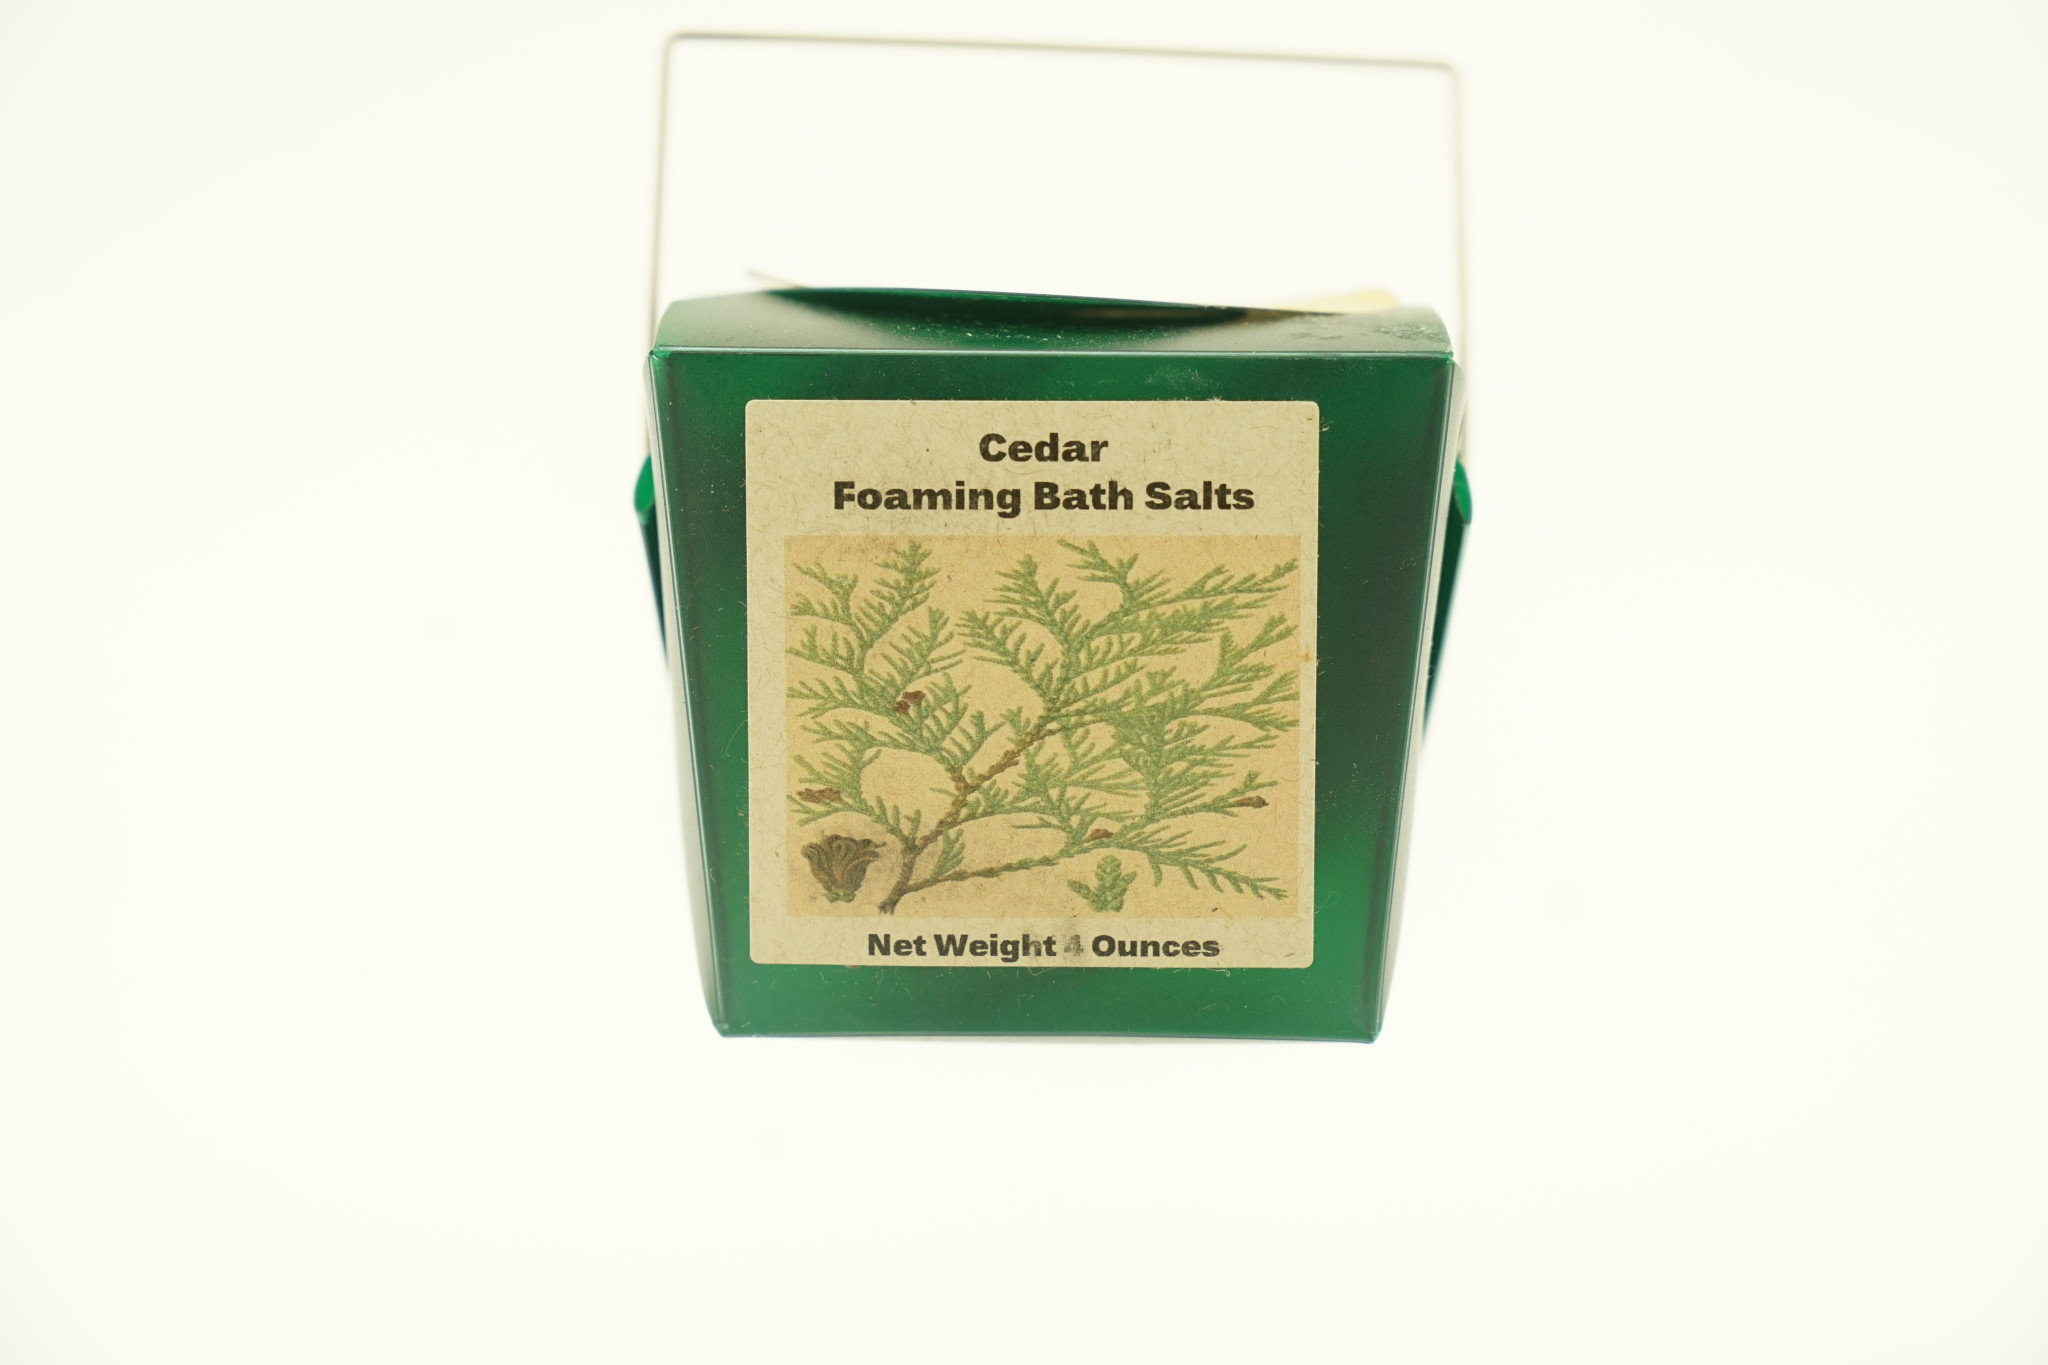 Native Blend Foaming Bath Salts